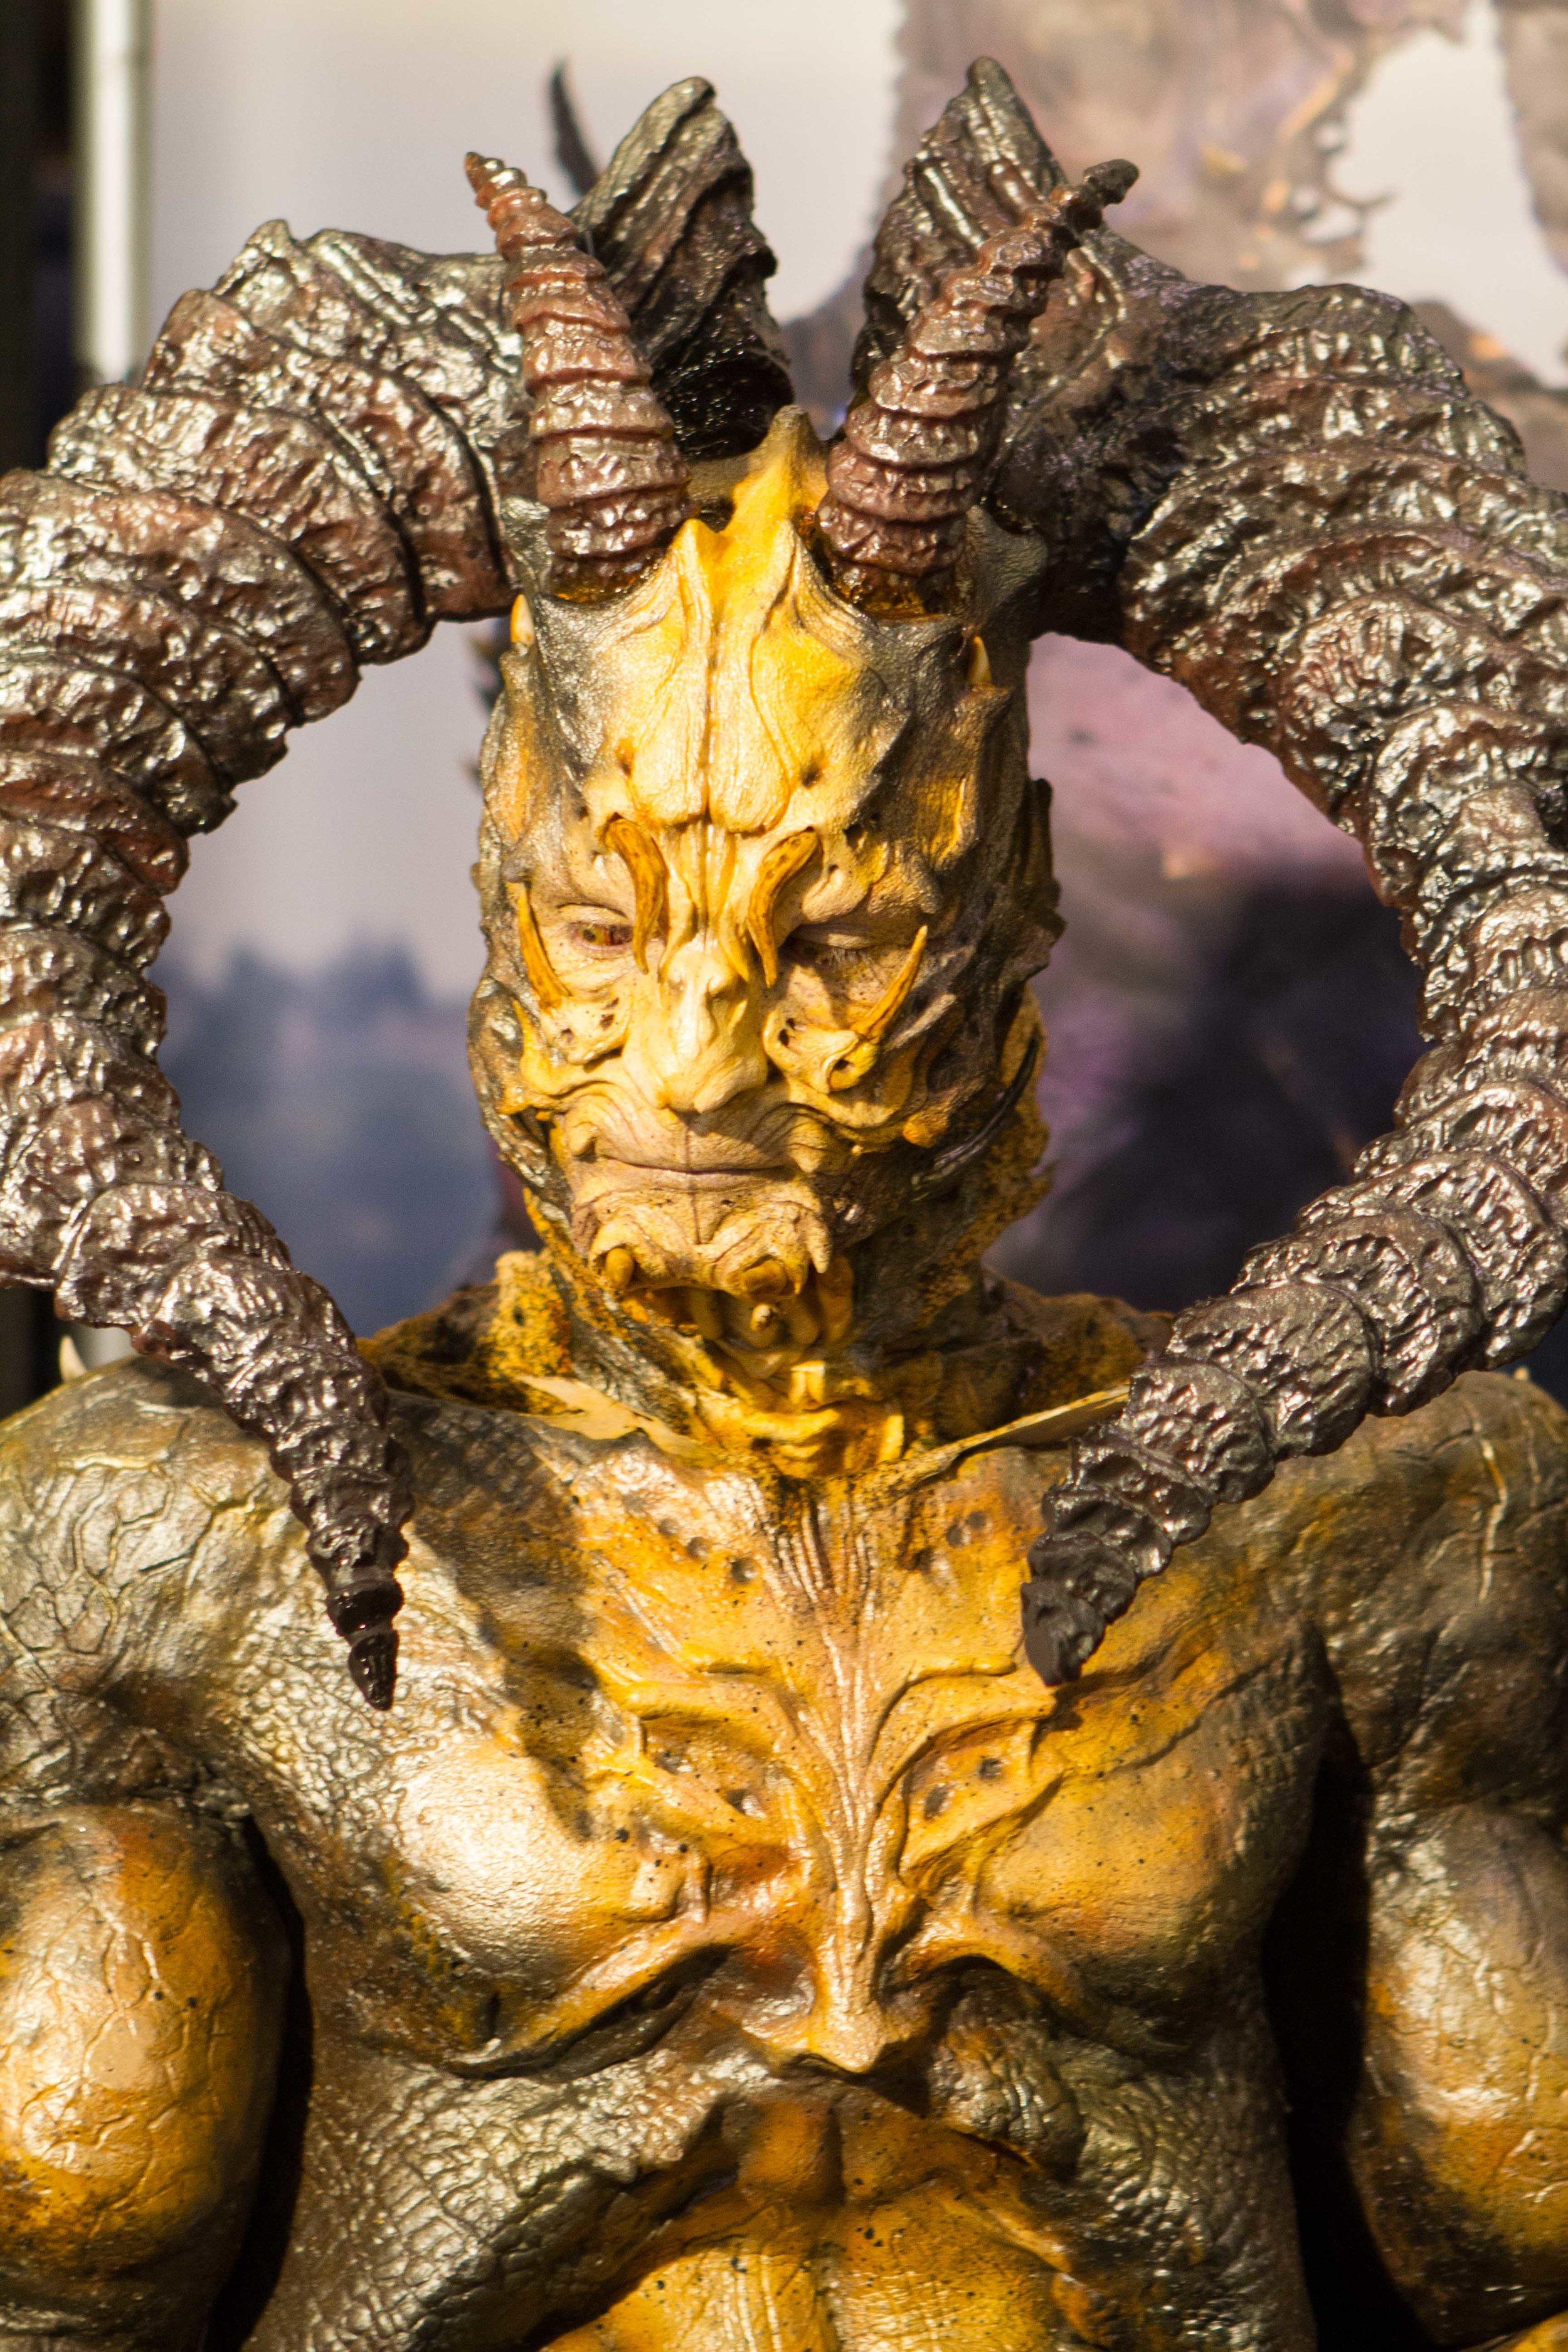 IMATS 2017 - FX Creator Josef Rarach & Vlad Taupesh Fantasy Special Effects Makeup (www.creativecastlestudios.com:fx-creator - www.KyleReaArt.com - www.KyleReaPhotography.com) 24.jpg